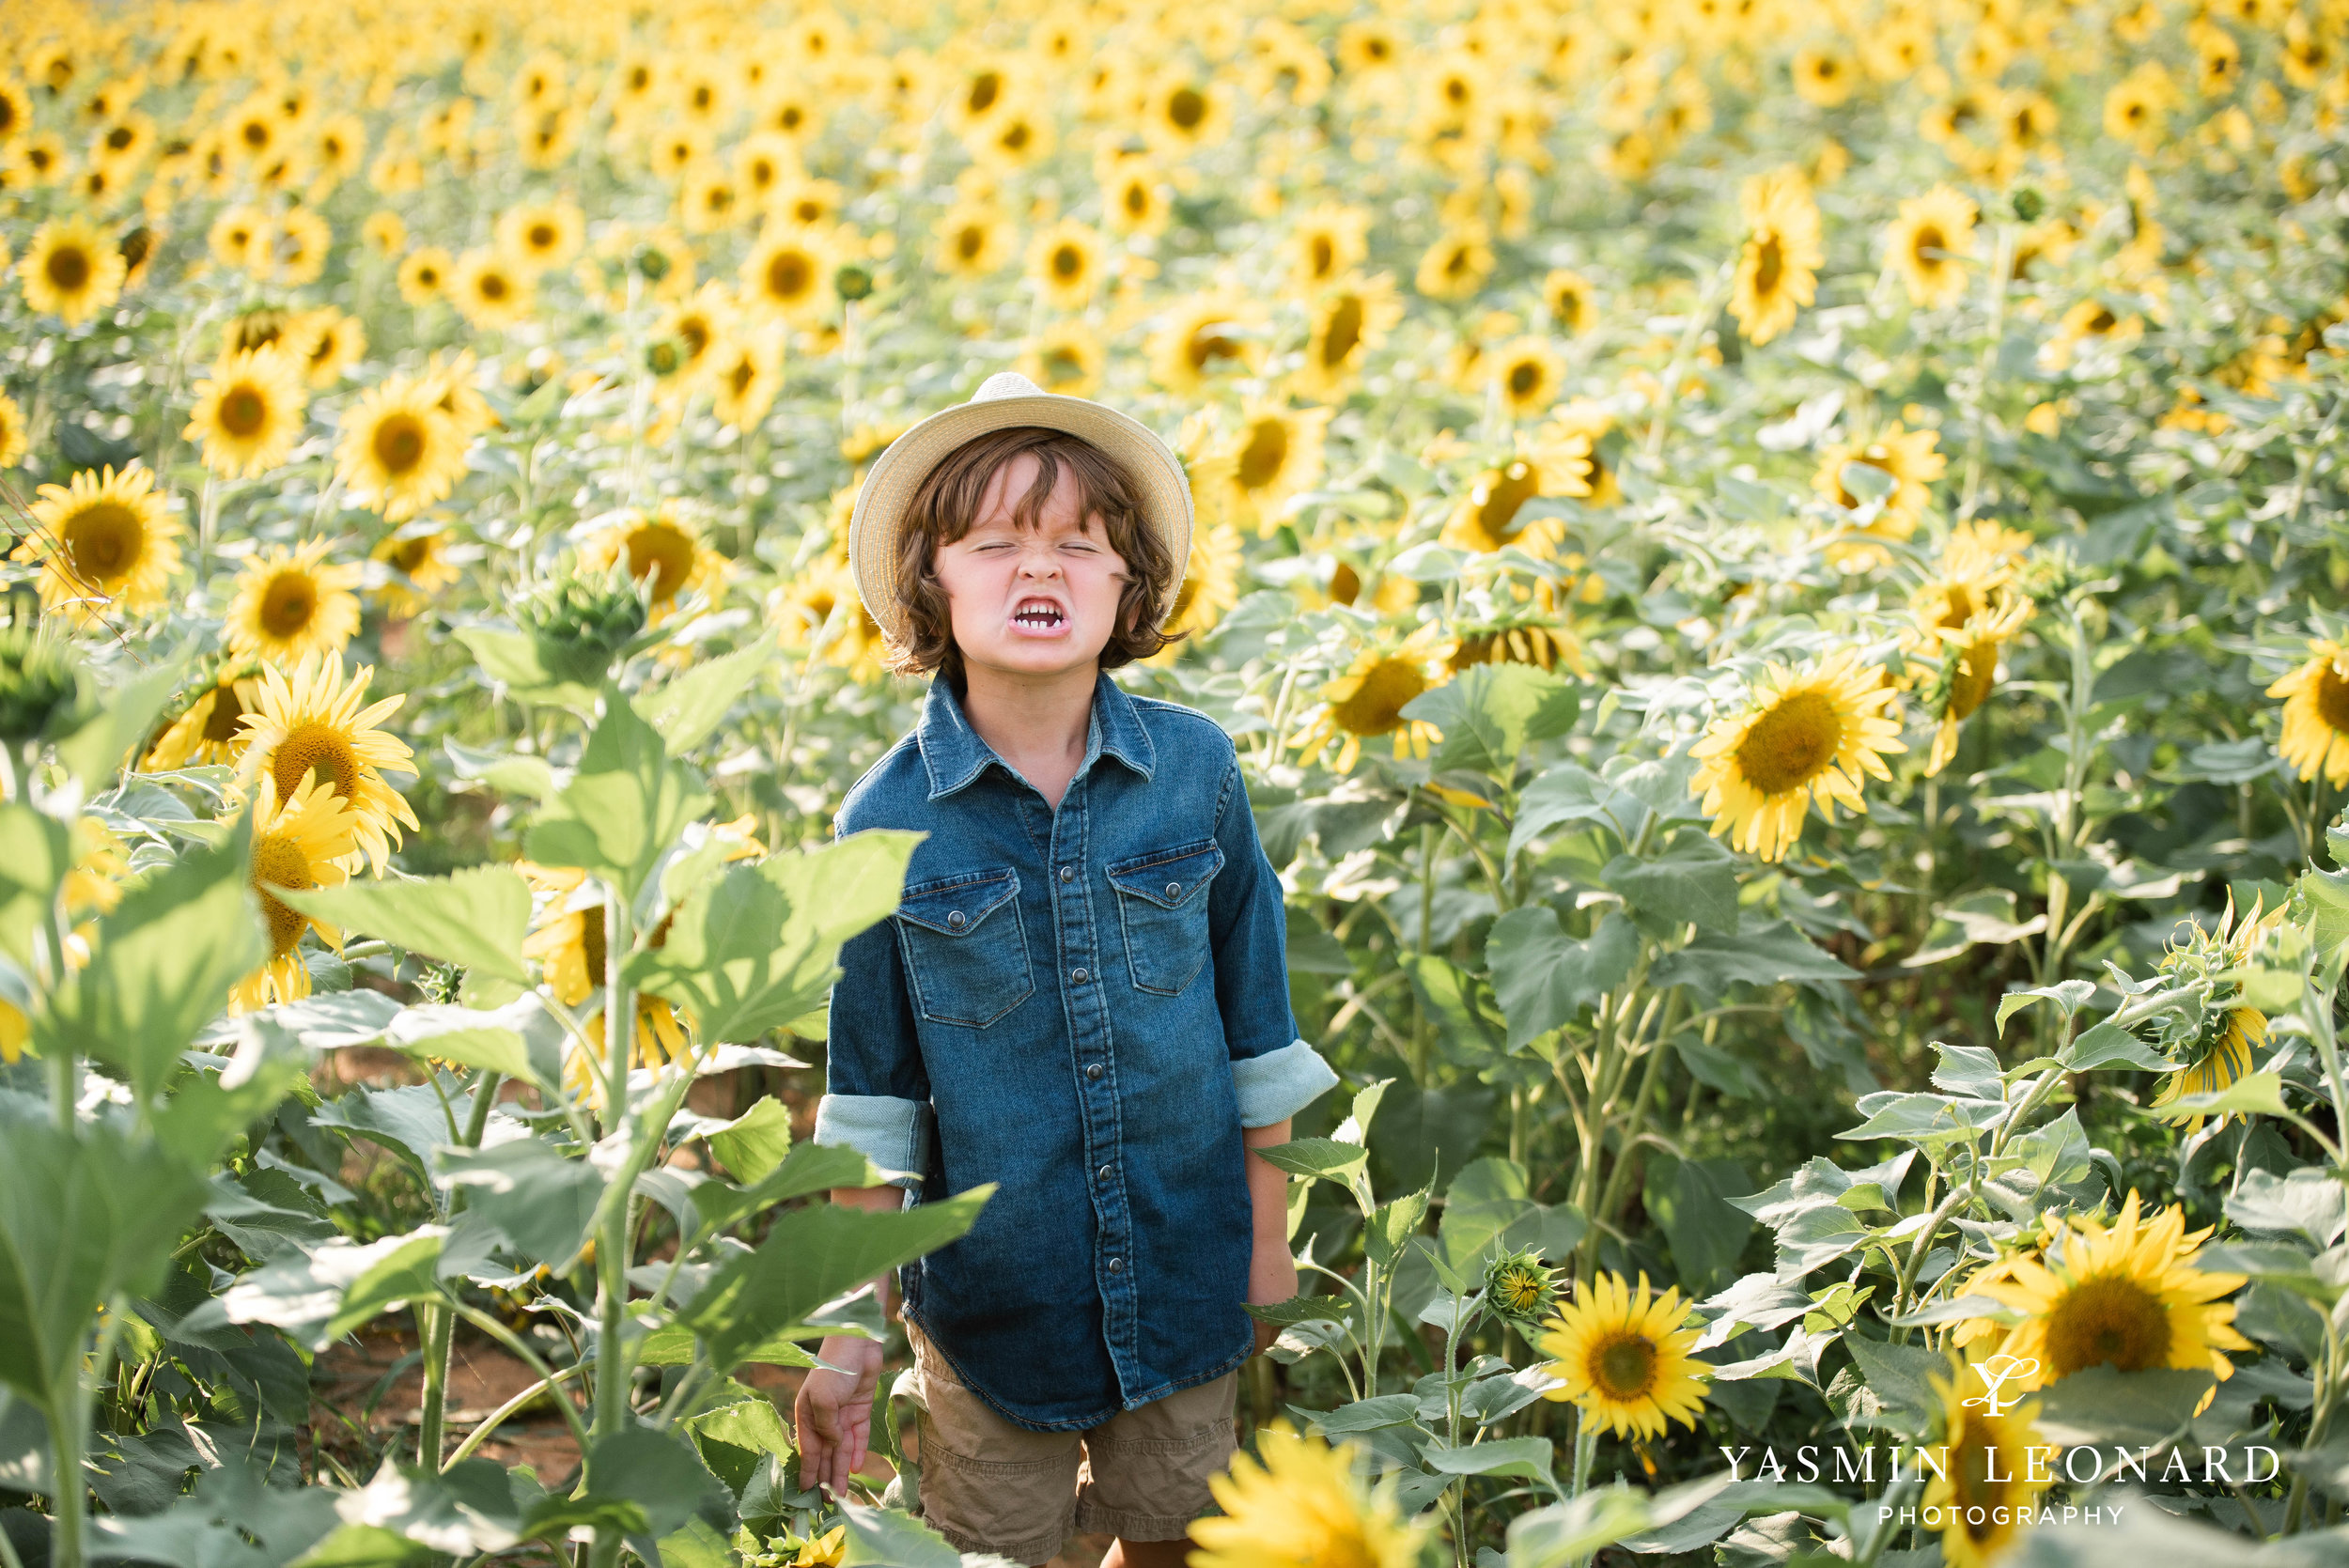 Sunflower Mini Session - Dogwood Farms - Sunflower Field - Boys in Sunflower Field - What to wear sunflower field - Yasmin Leonard Photography-5.jpg